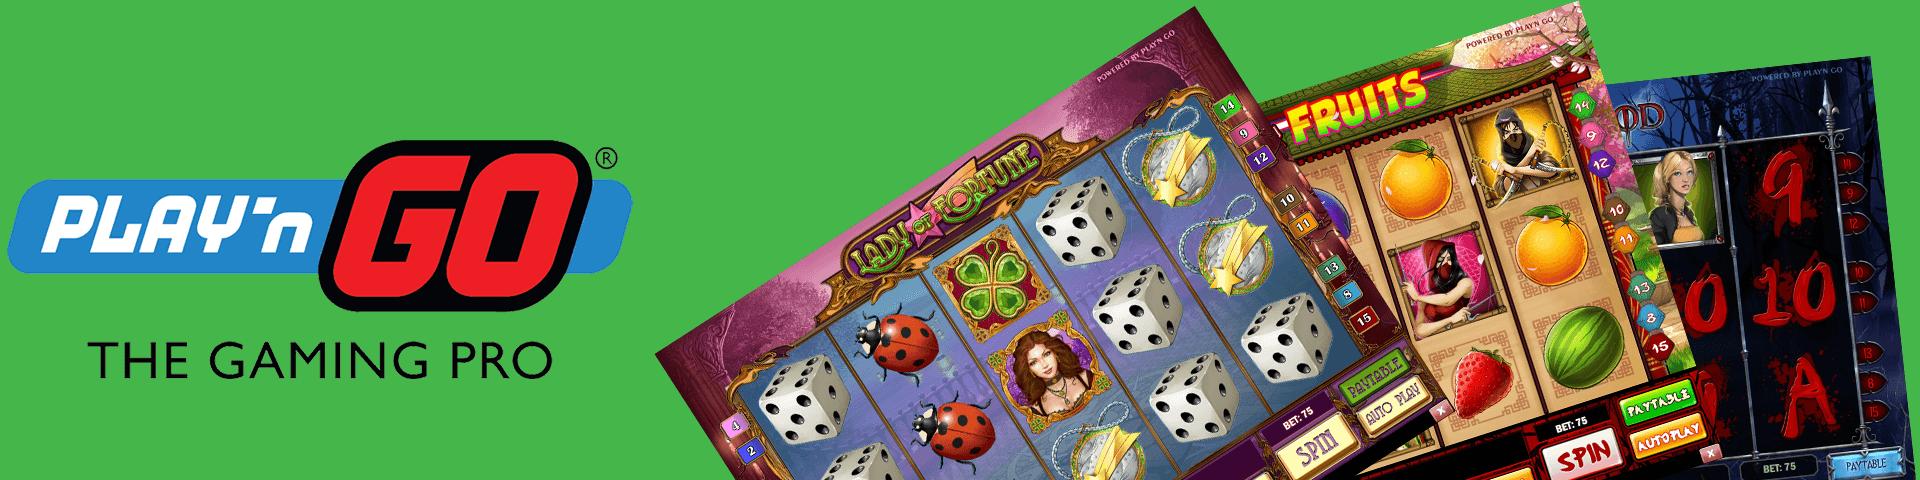 jocuri-casino-PlaynGO-multabafta-slider